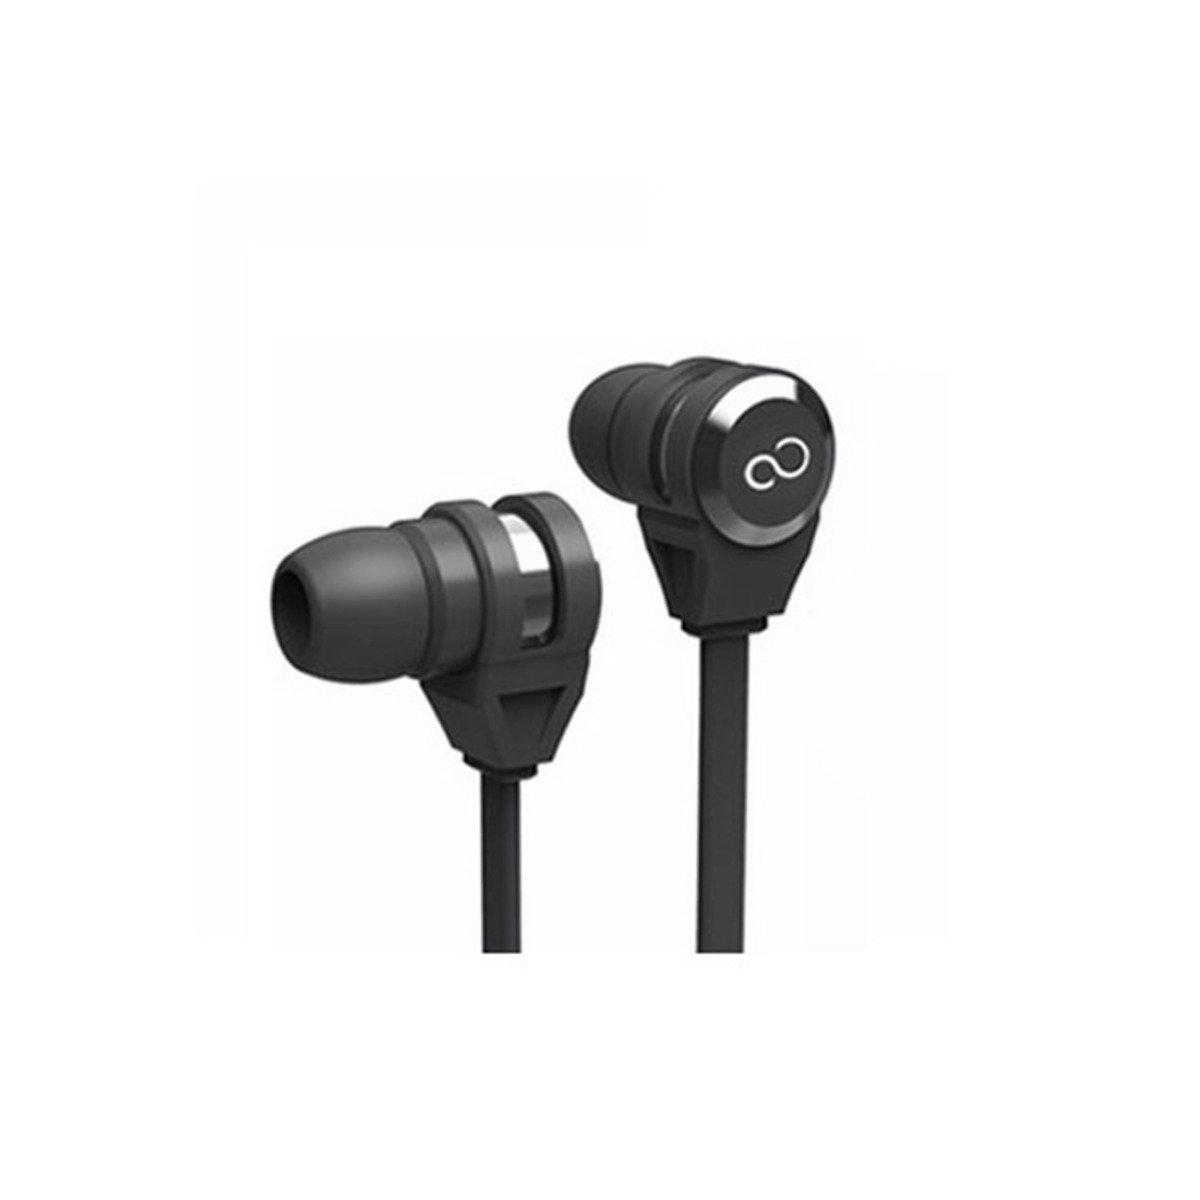 E11B/W IN-EAR EARPHONE w/Mic IOS/Android